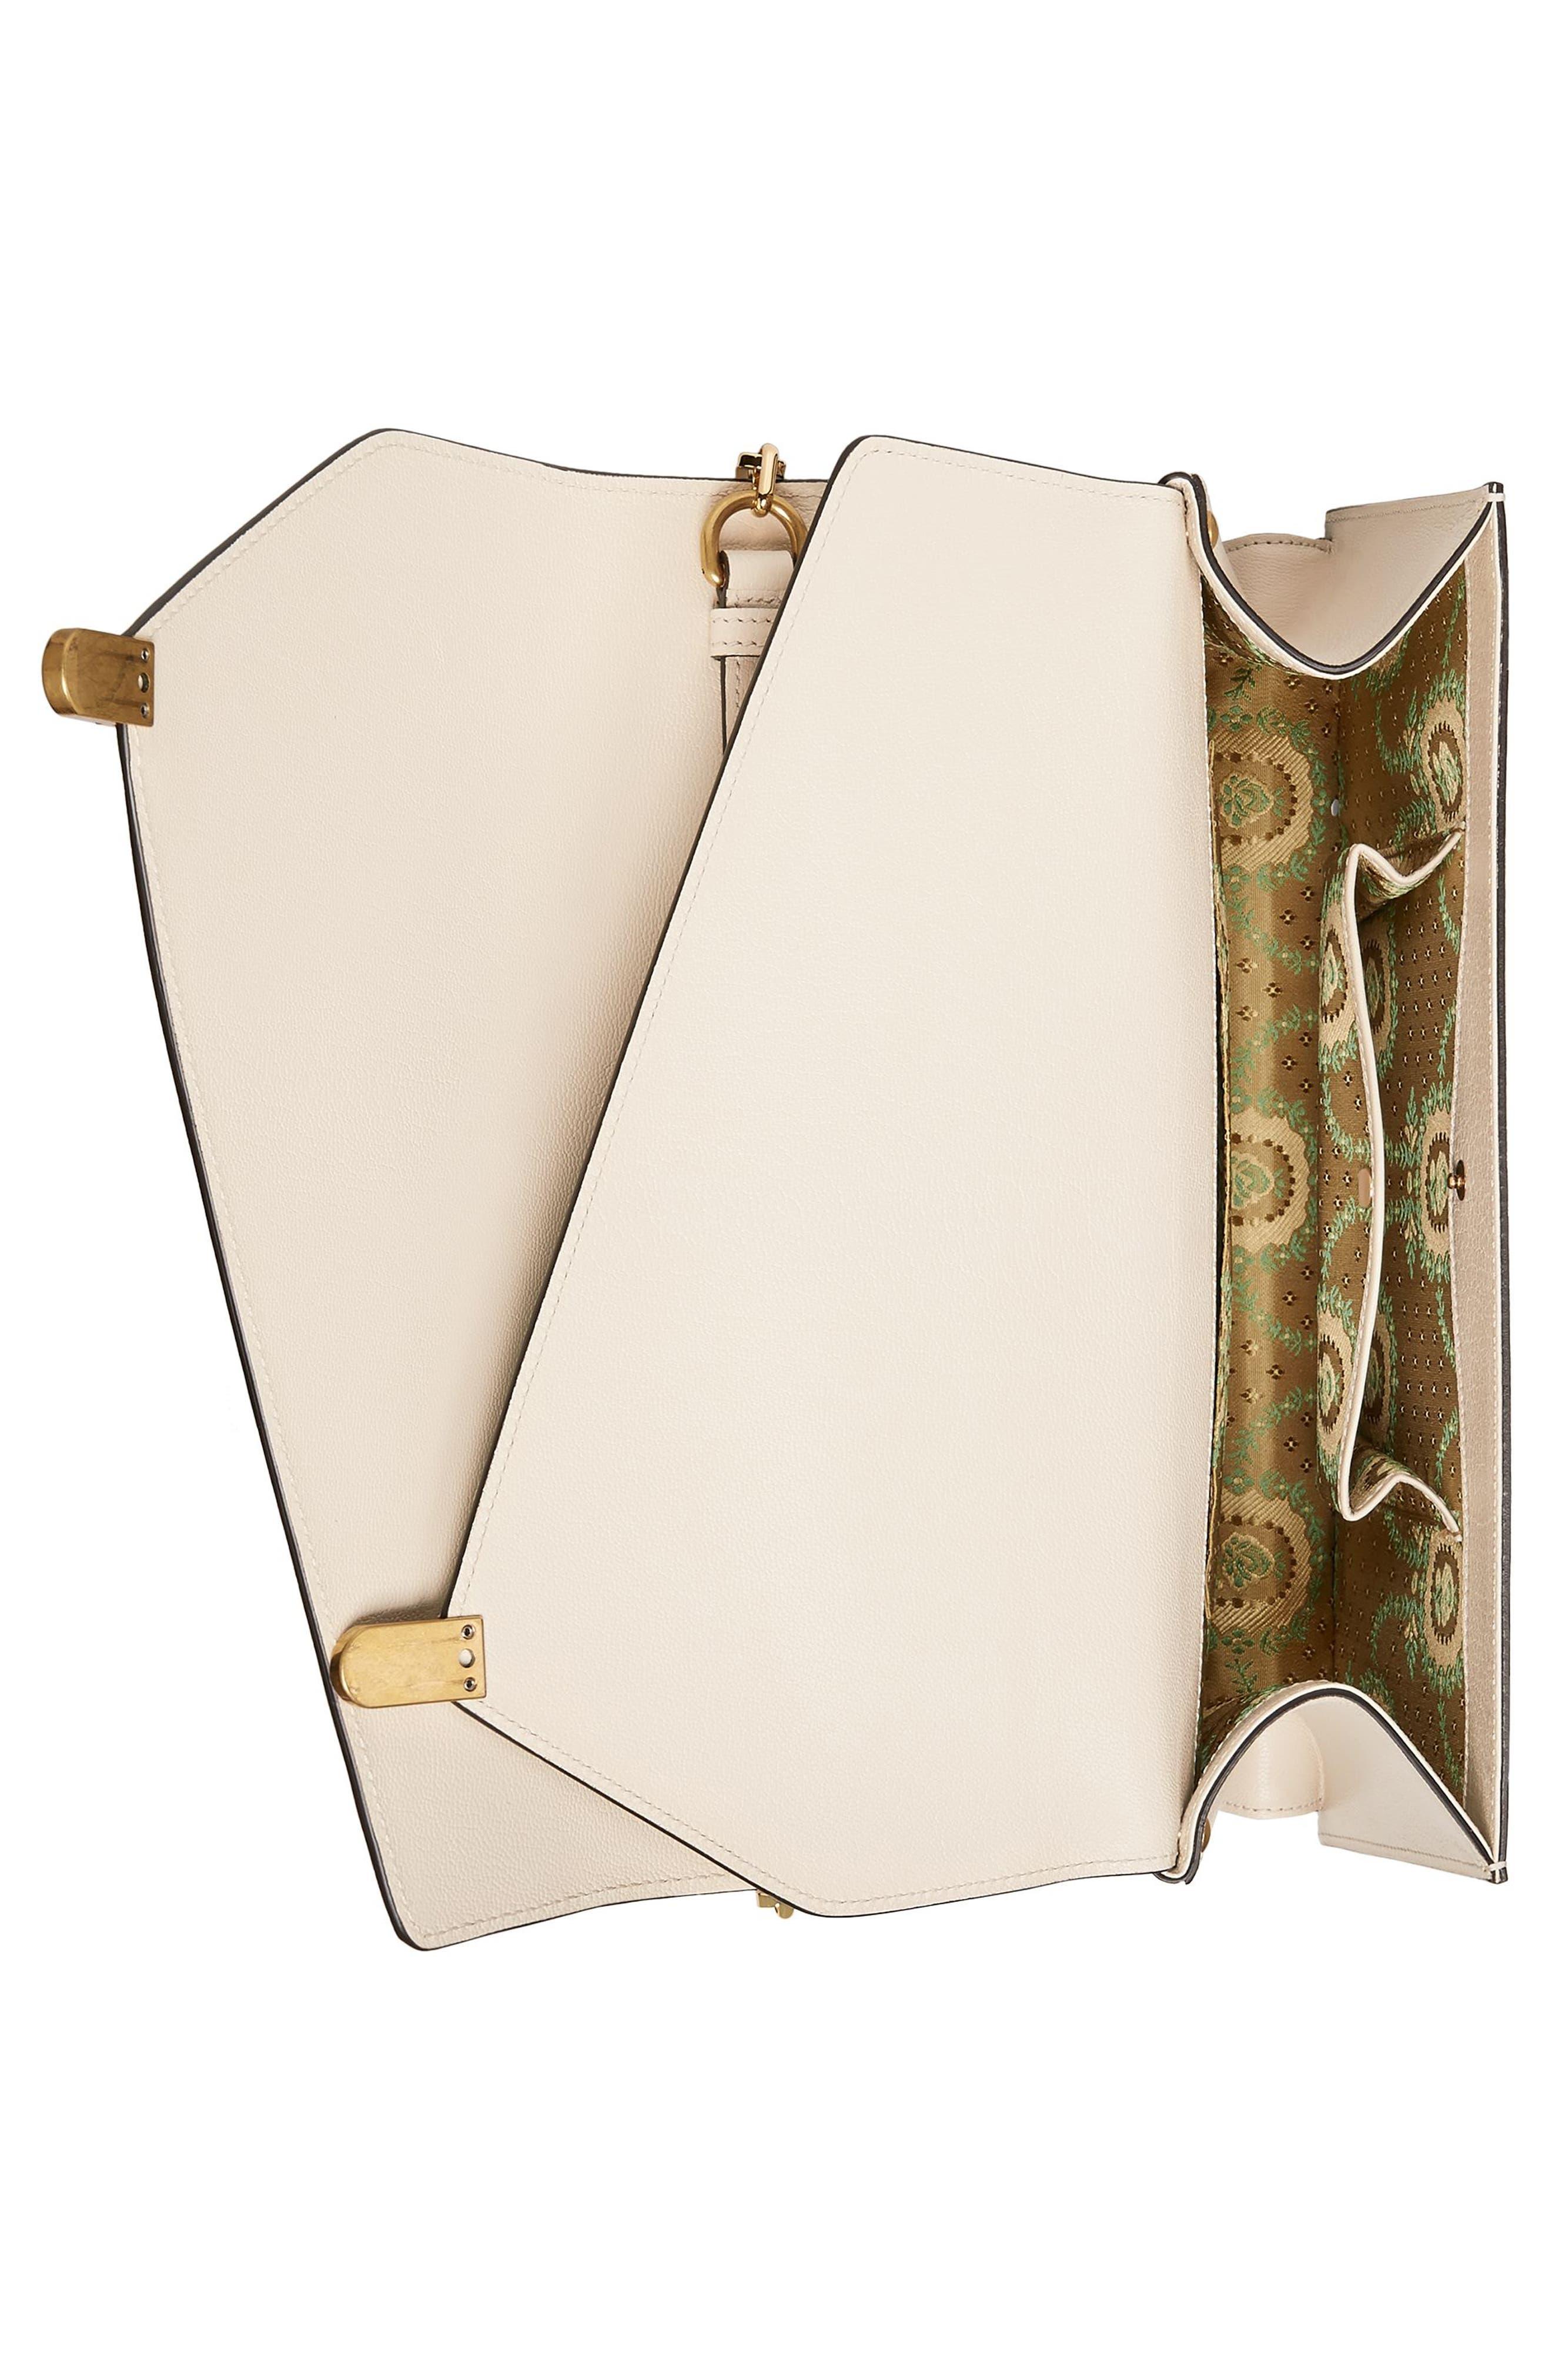 Medium Linea P Butterfly Painted Leather & Genuine Snakeskin Top Handle Satchel,                             Alternate thumbnail 3, color,